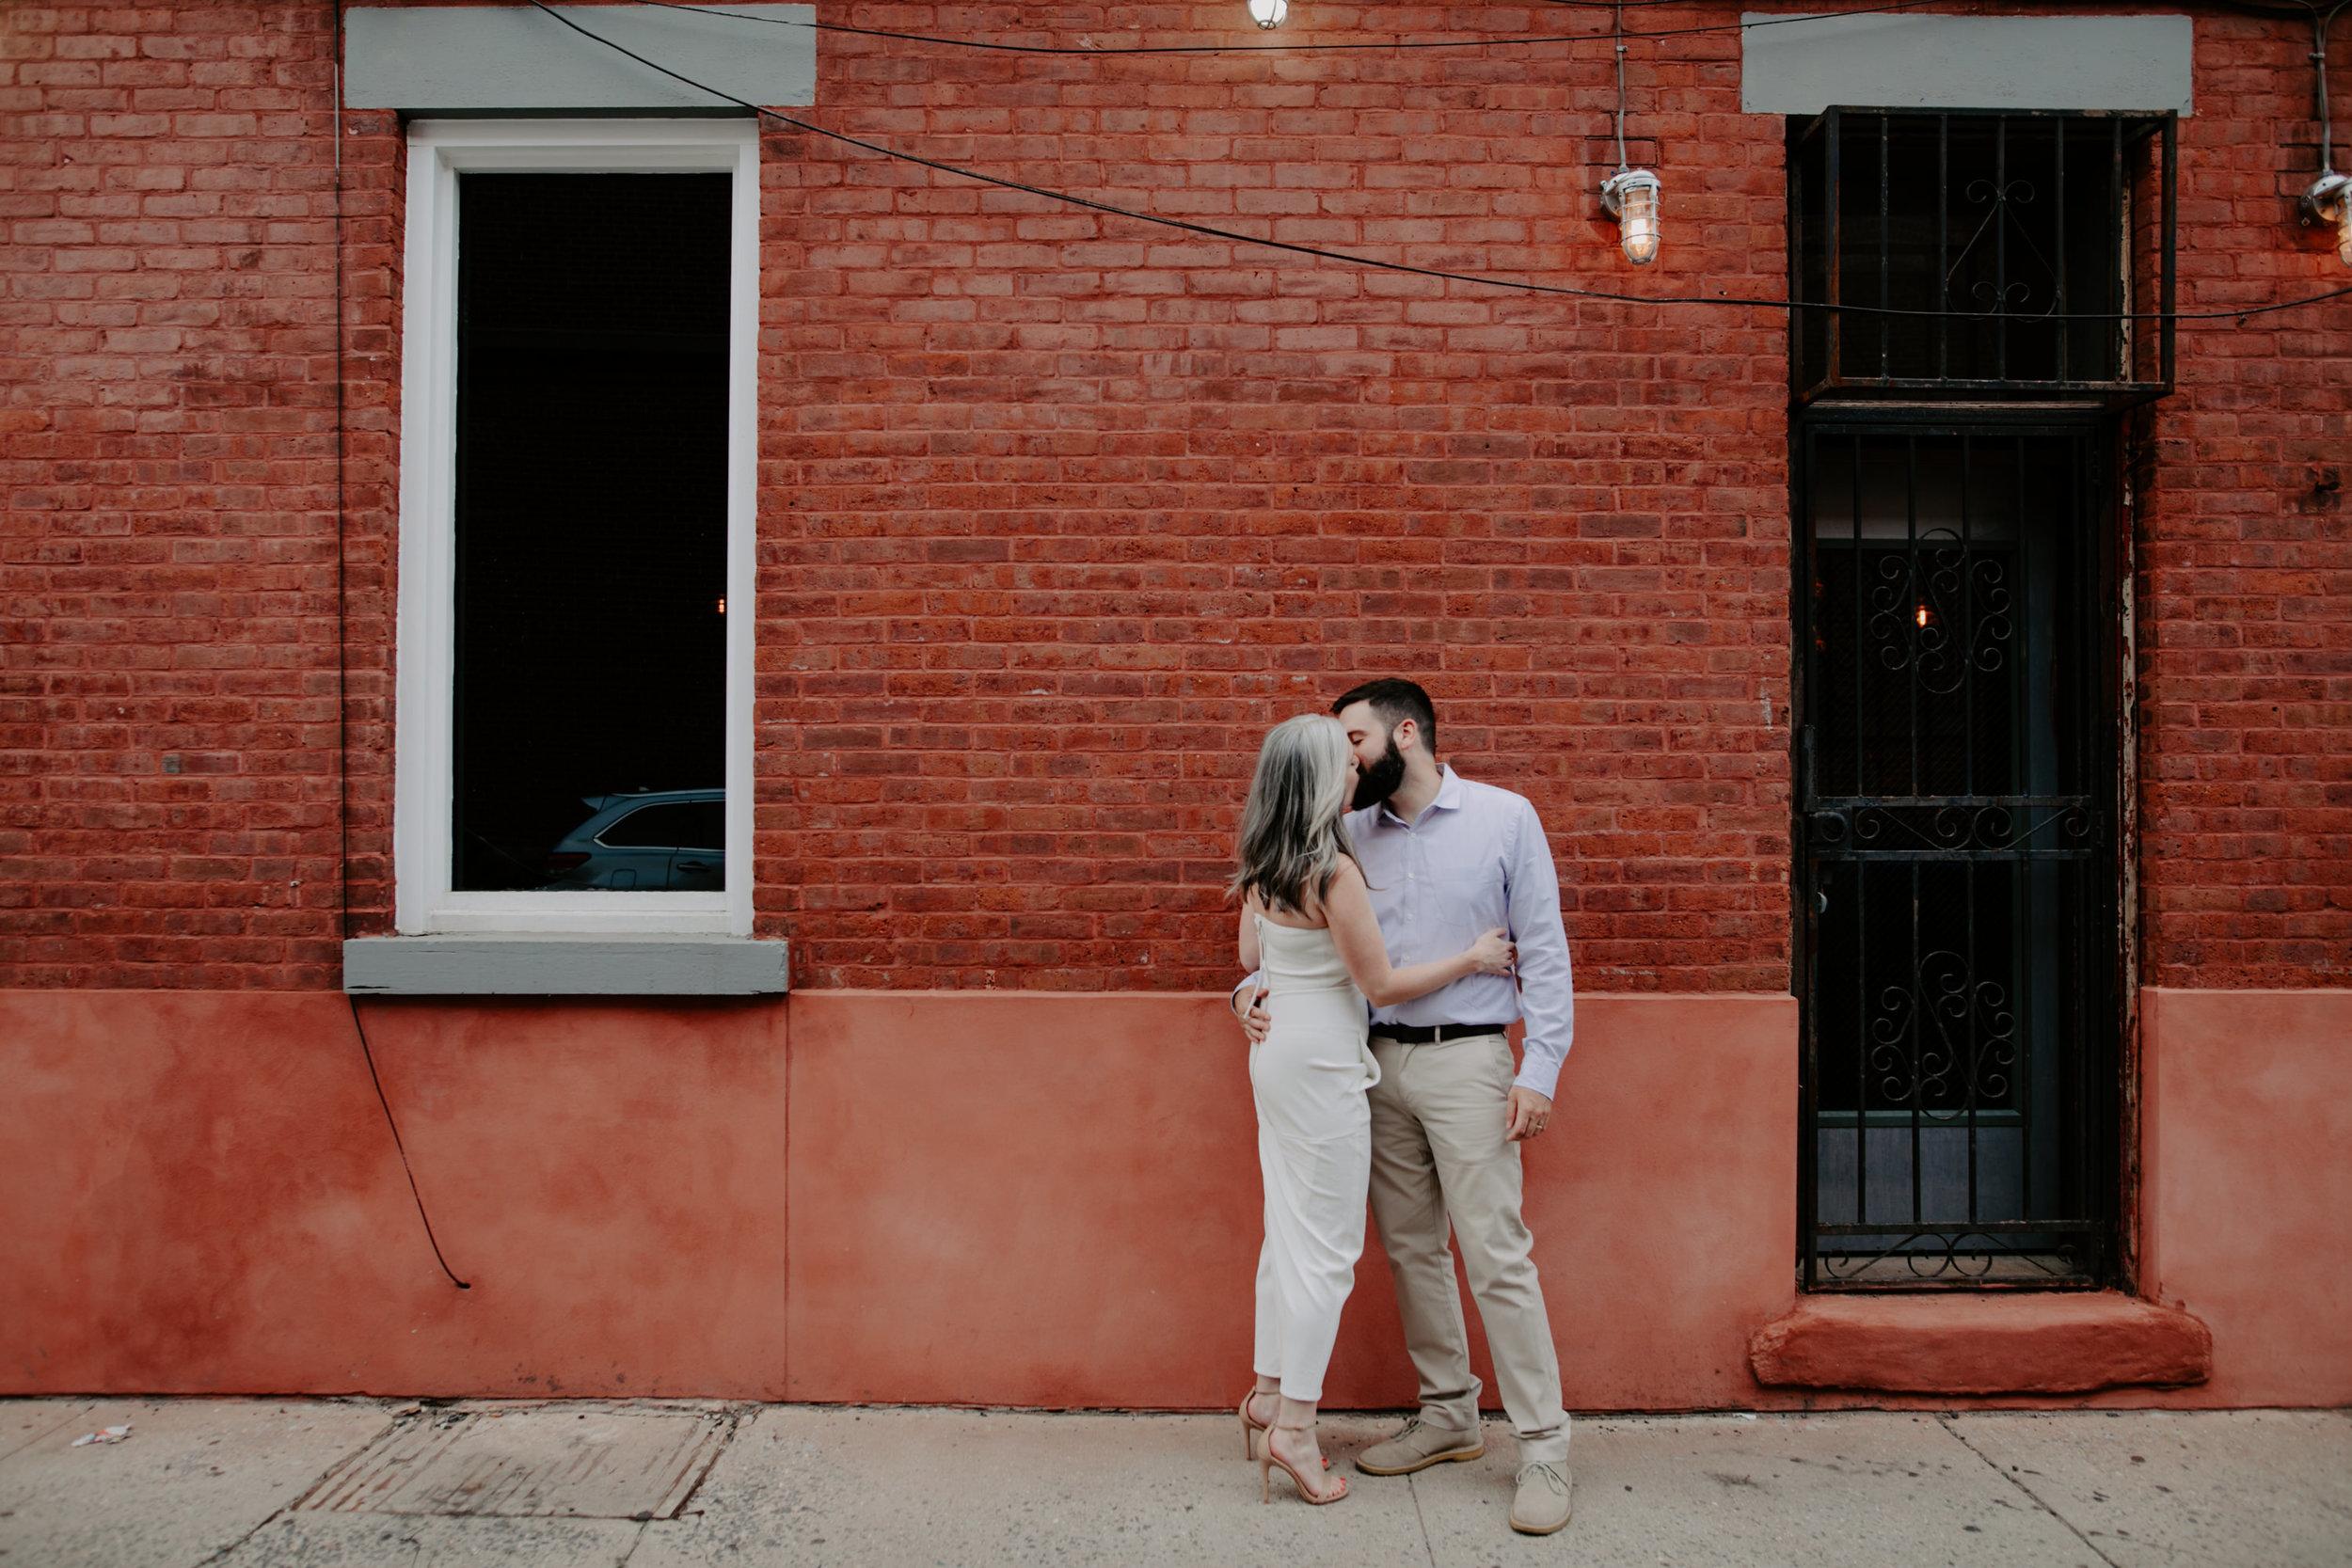 KateMax_JerseyCity_Lofi_Wedding_TowardsTheMoon-7.jpg